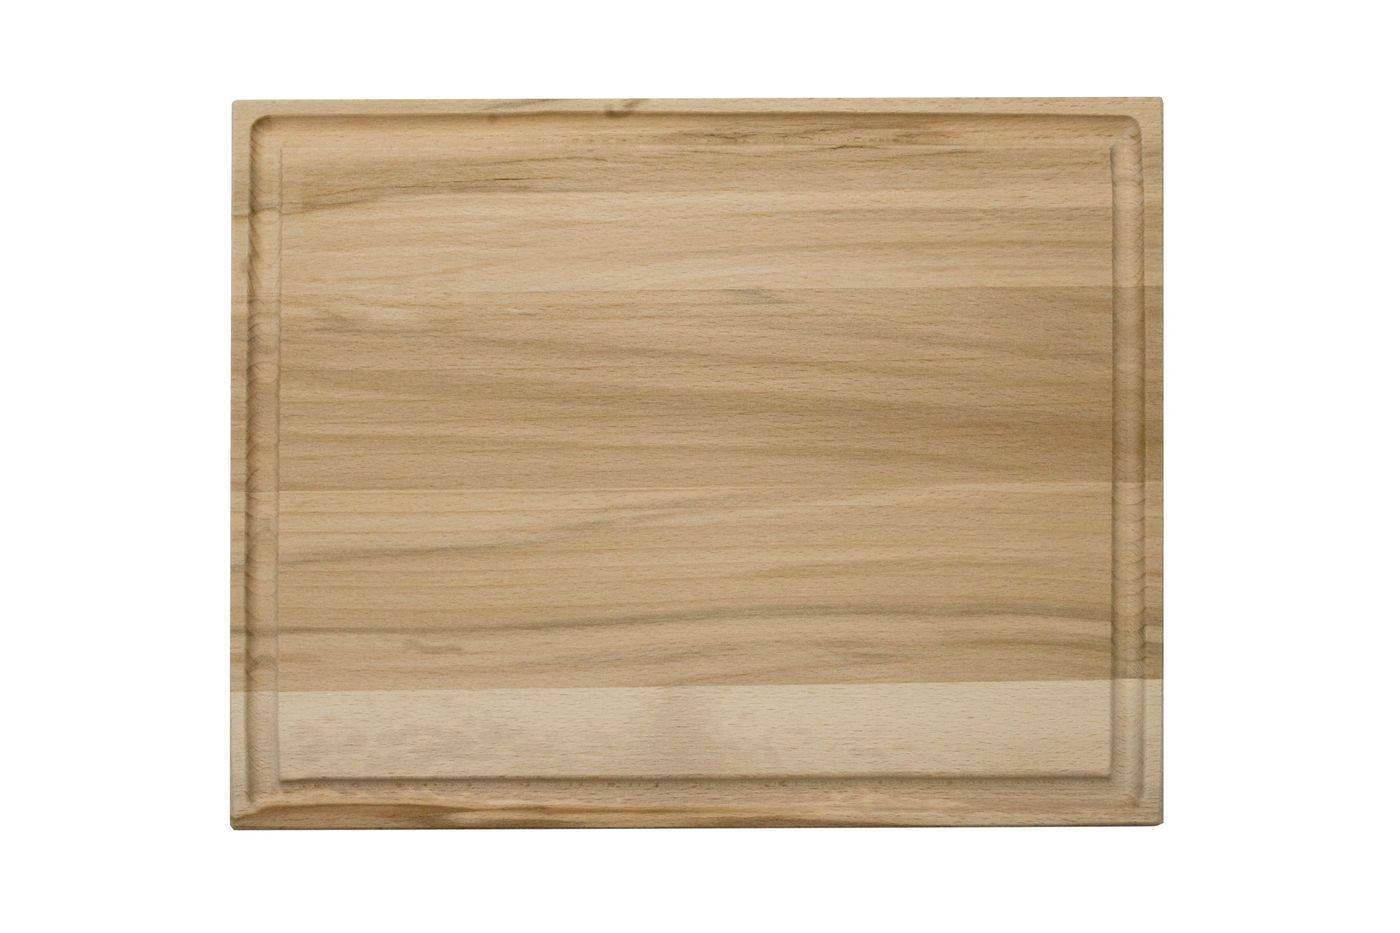 Deska na maso s drážkou, 350 x 200 x 20 mm - Dřevovýroba Otradov